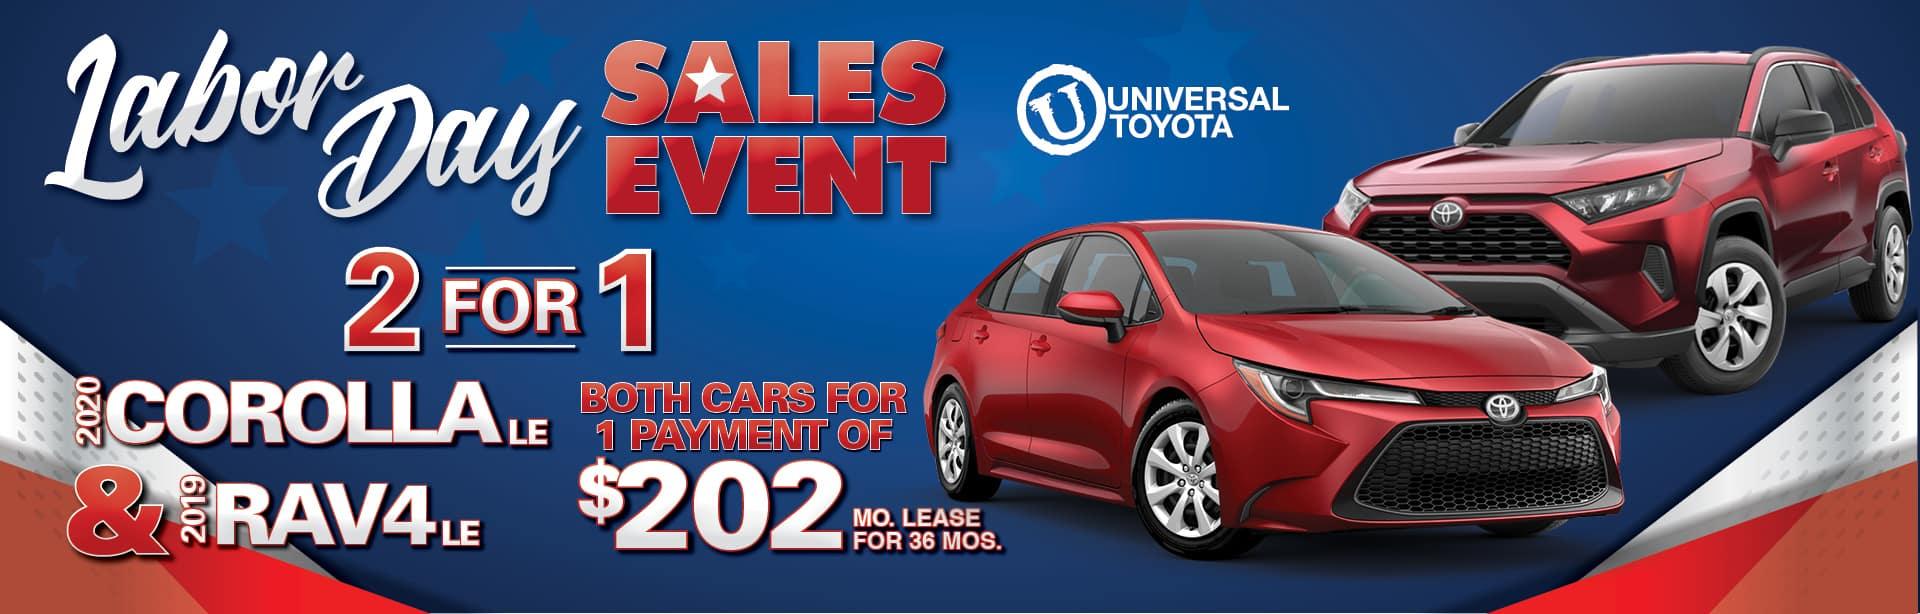 Universal Toyota | Toyota Sales & Service in San Antonio, TX